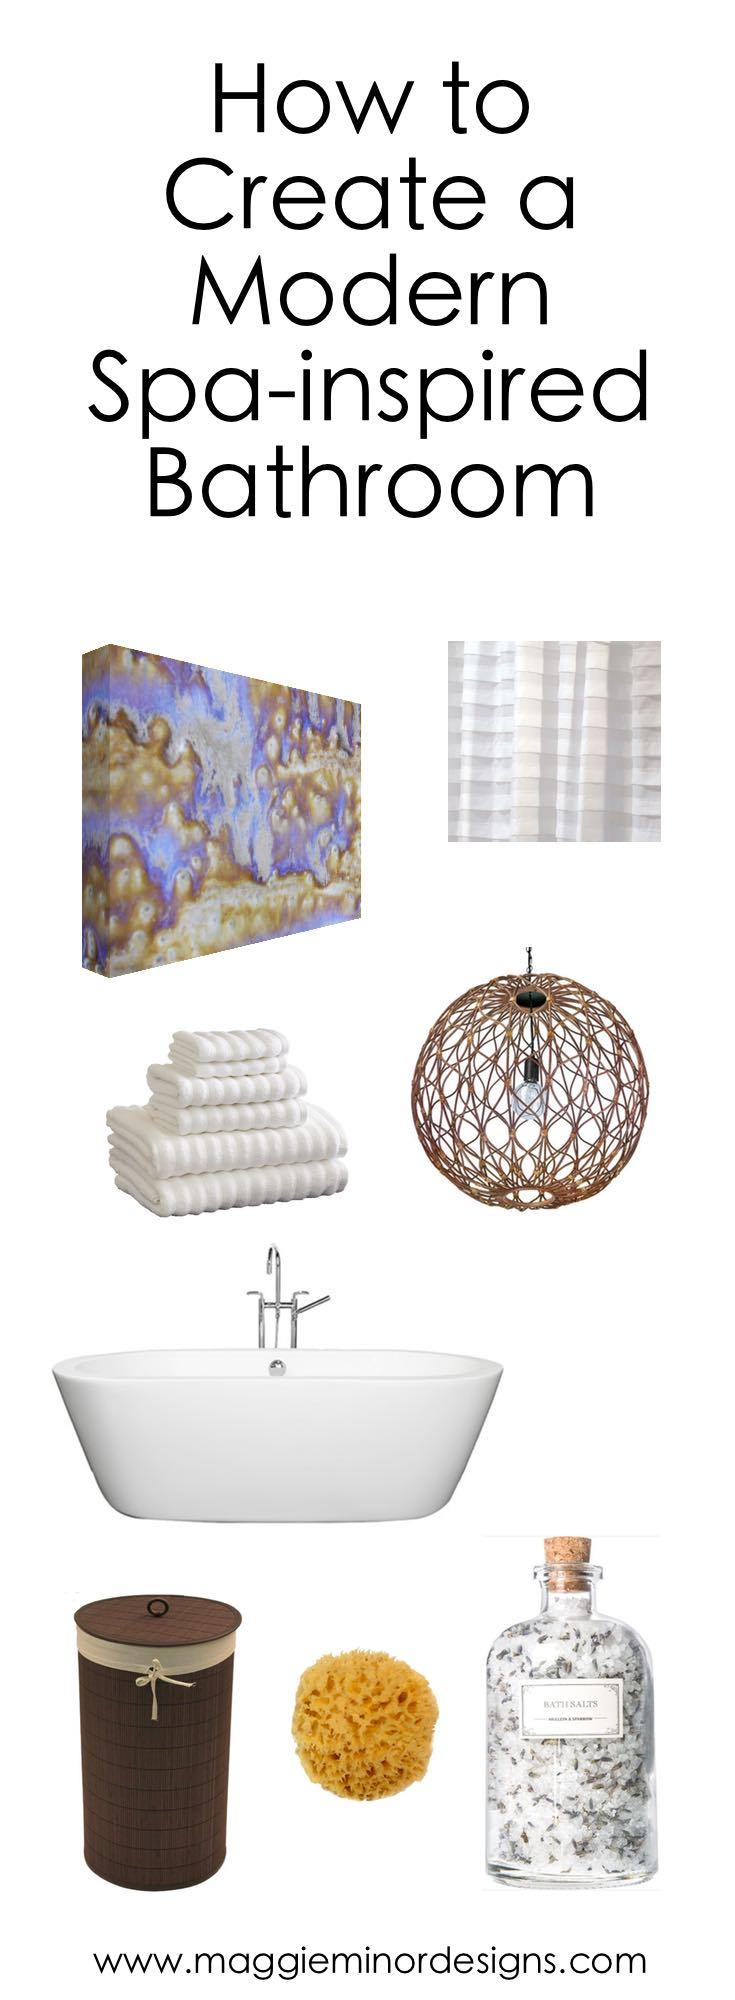 How to Create a Modern Spa Inspired Bathroom